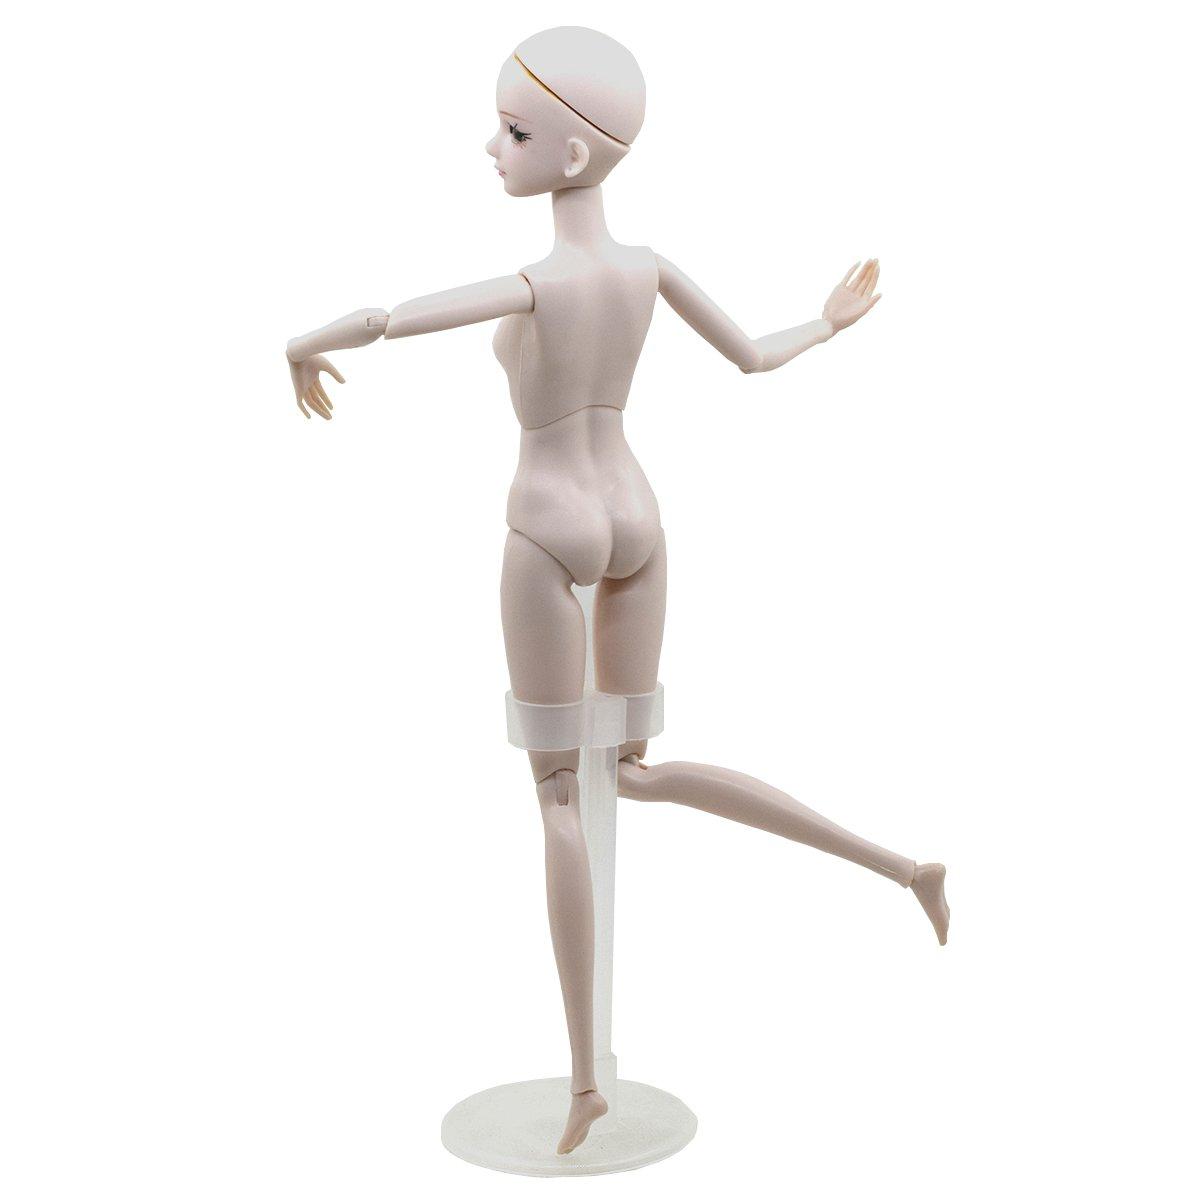 EVA BJD Customized Doll 1/6 SD Doll 11 inch Ball Jointed Dolls BJD Doll + Basic Makeup for DIY Dolls